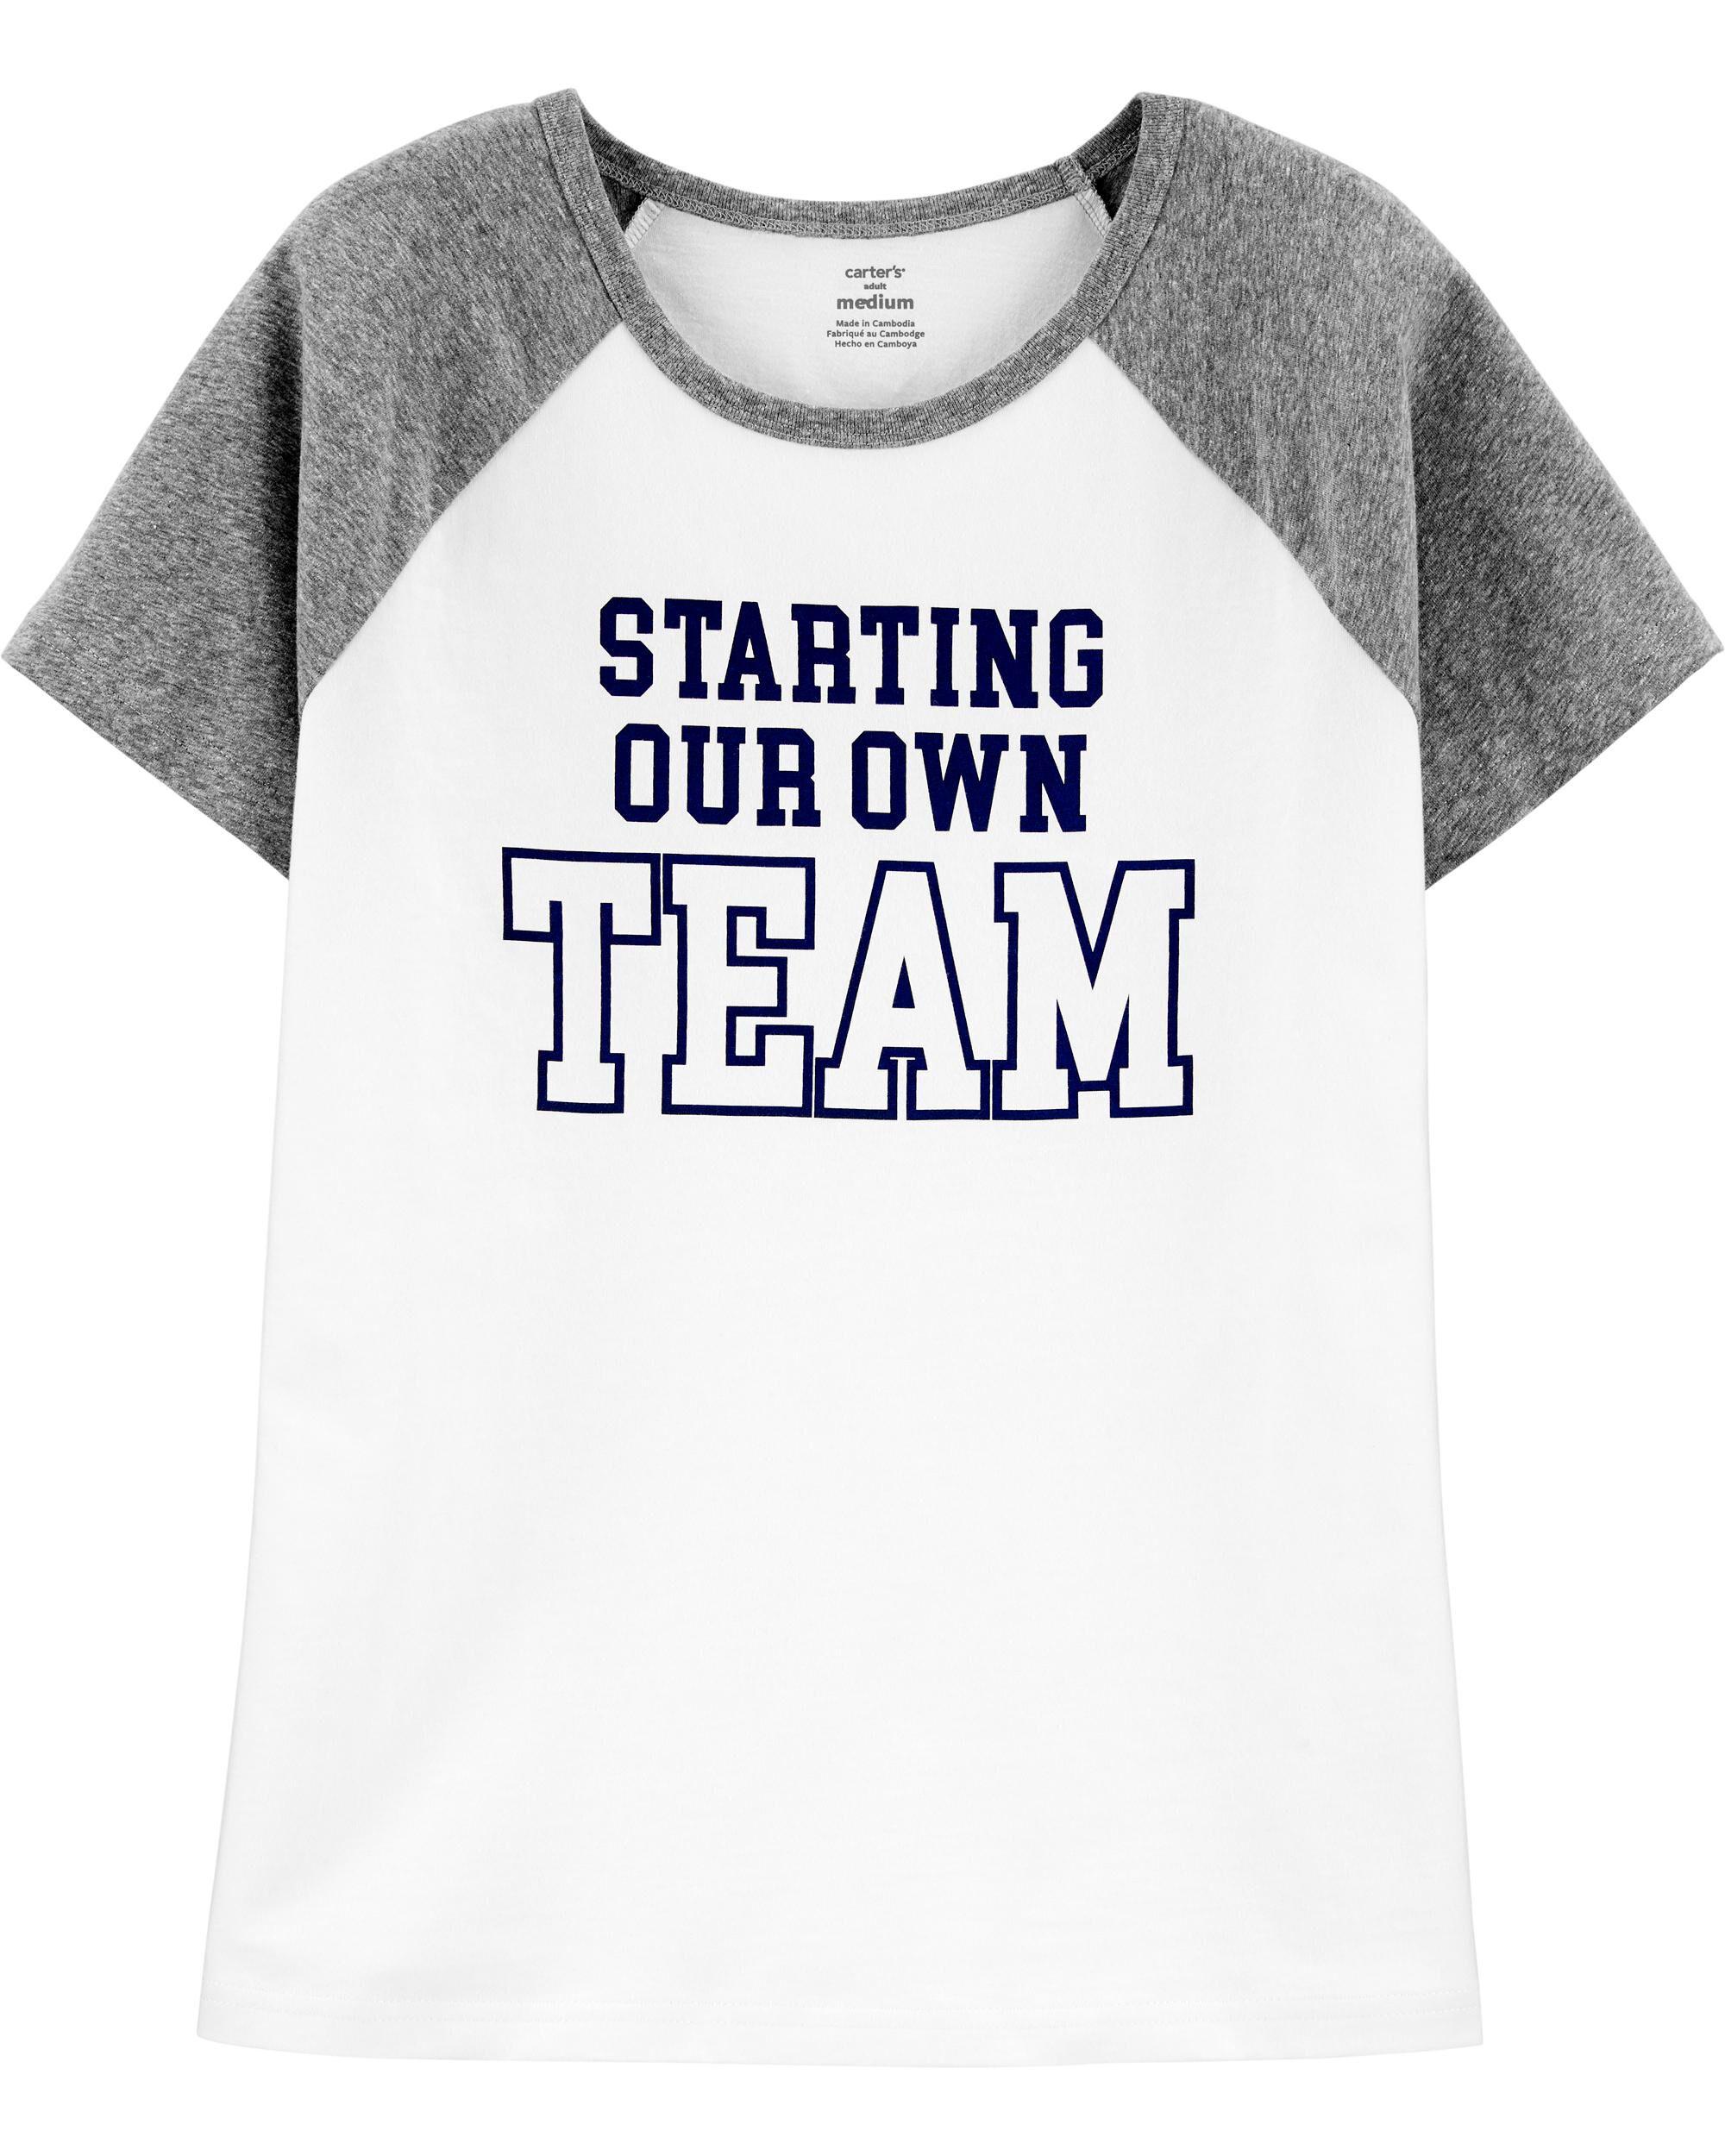 Oshkoshbgosh Adult Womens Starting Our Own Team Tee